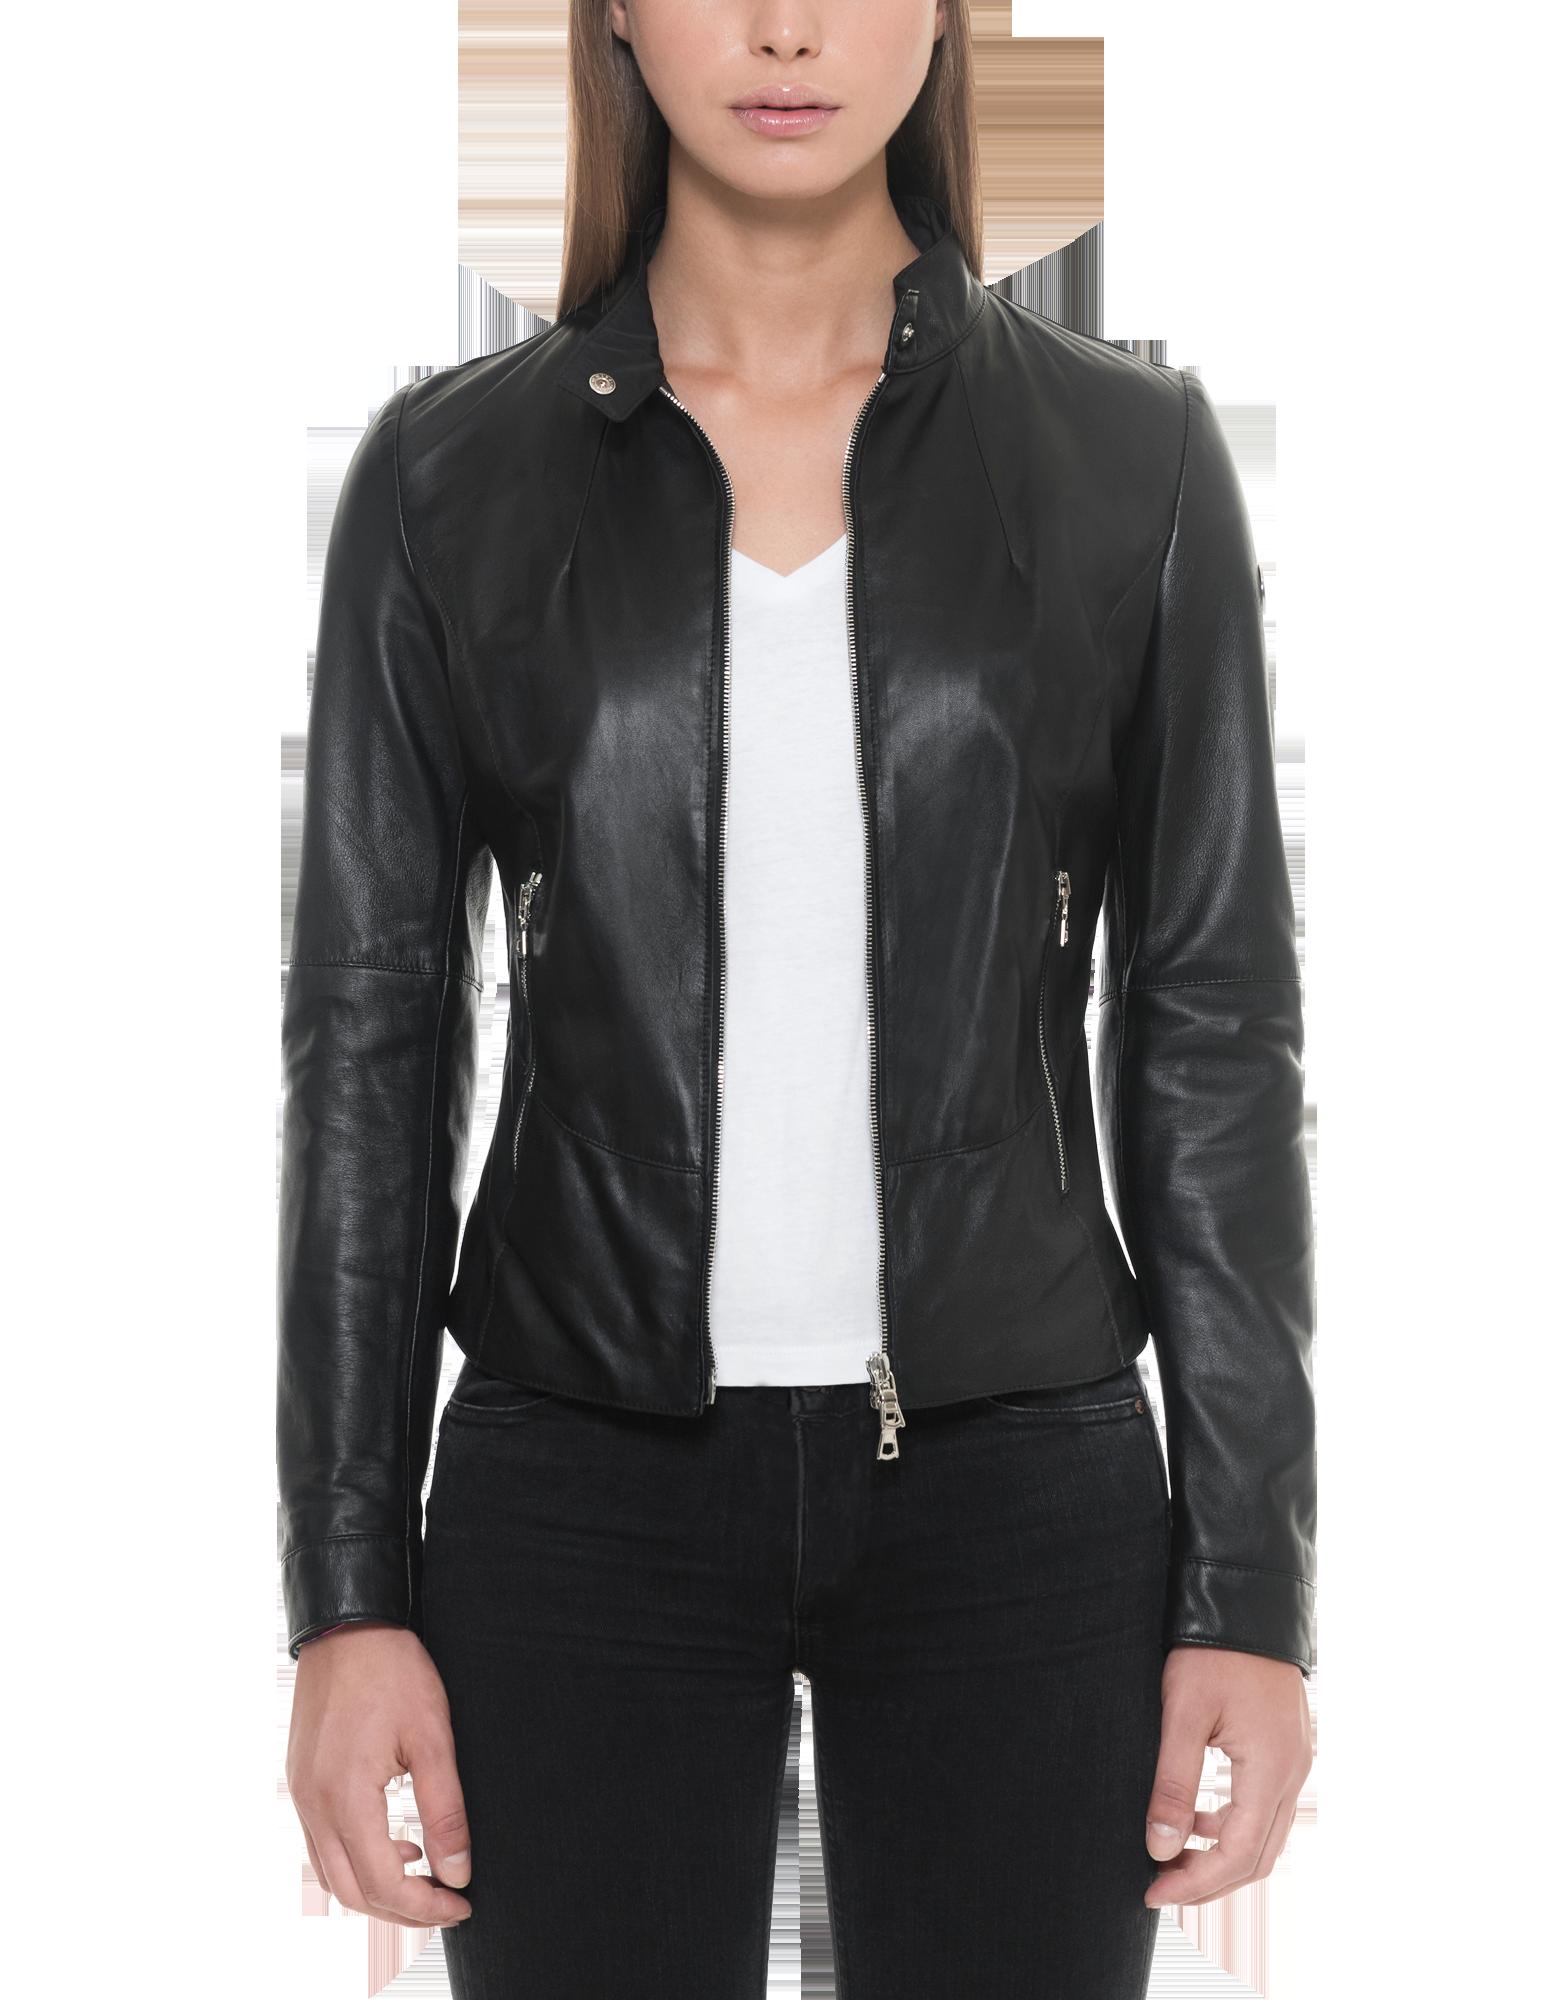 Image of Black Leather Women's Jacket w/Zip Pockets